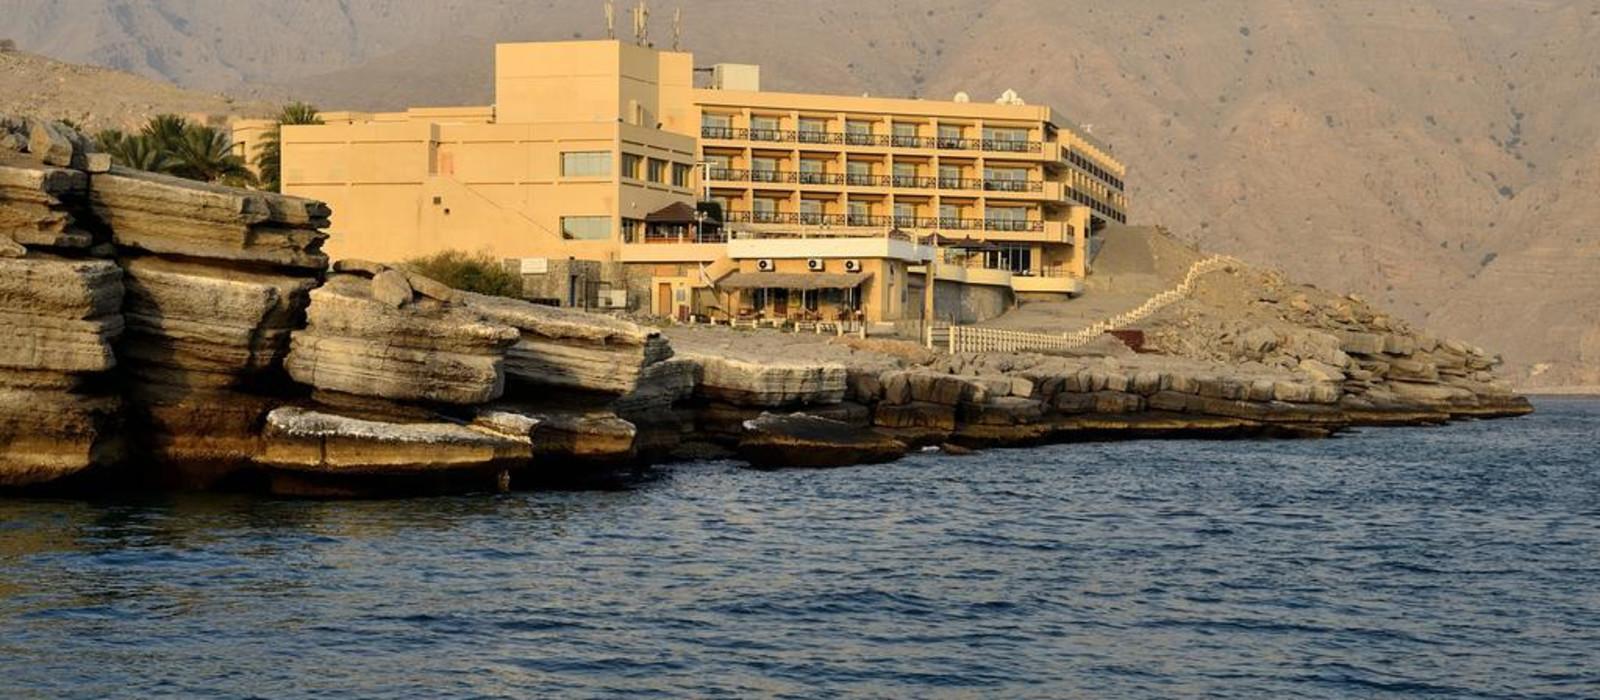 Hotel Atana Khasab  Oman